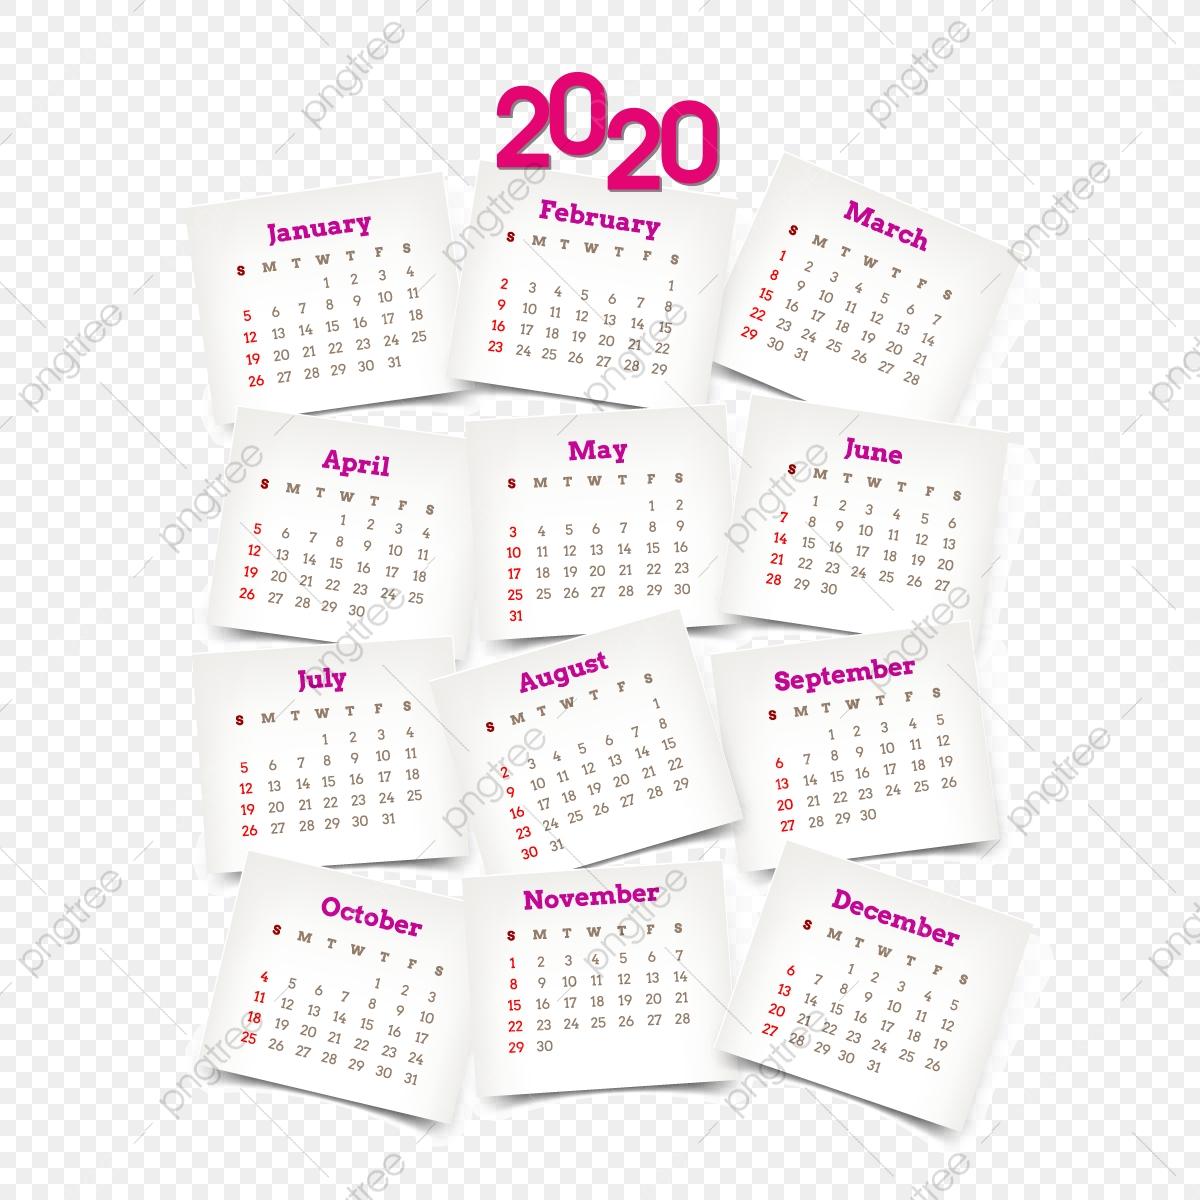 Yearly Pink Calendar 2020 2020 Calendar, Calendar 2020